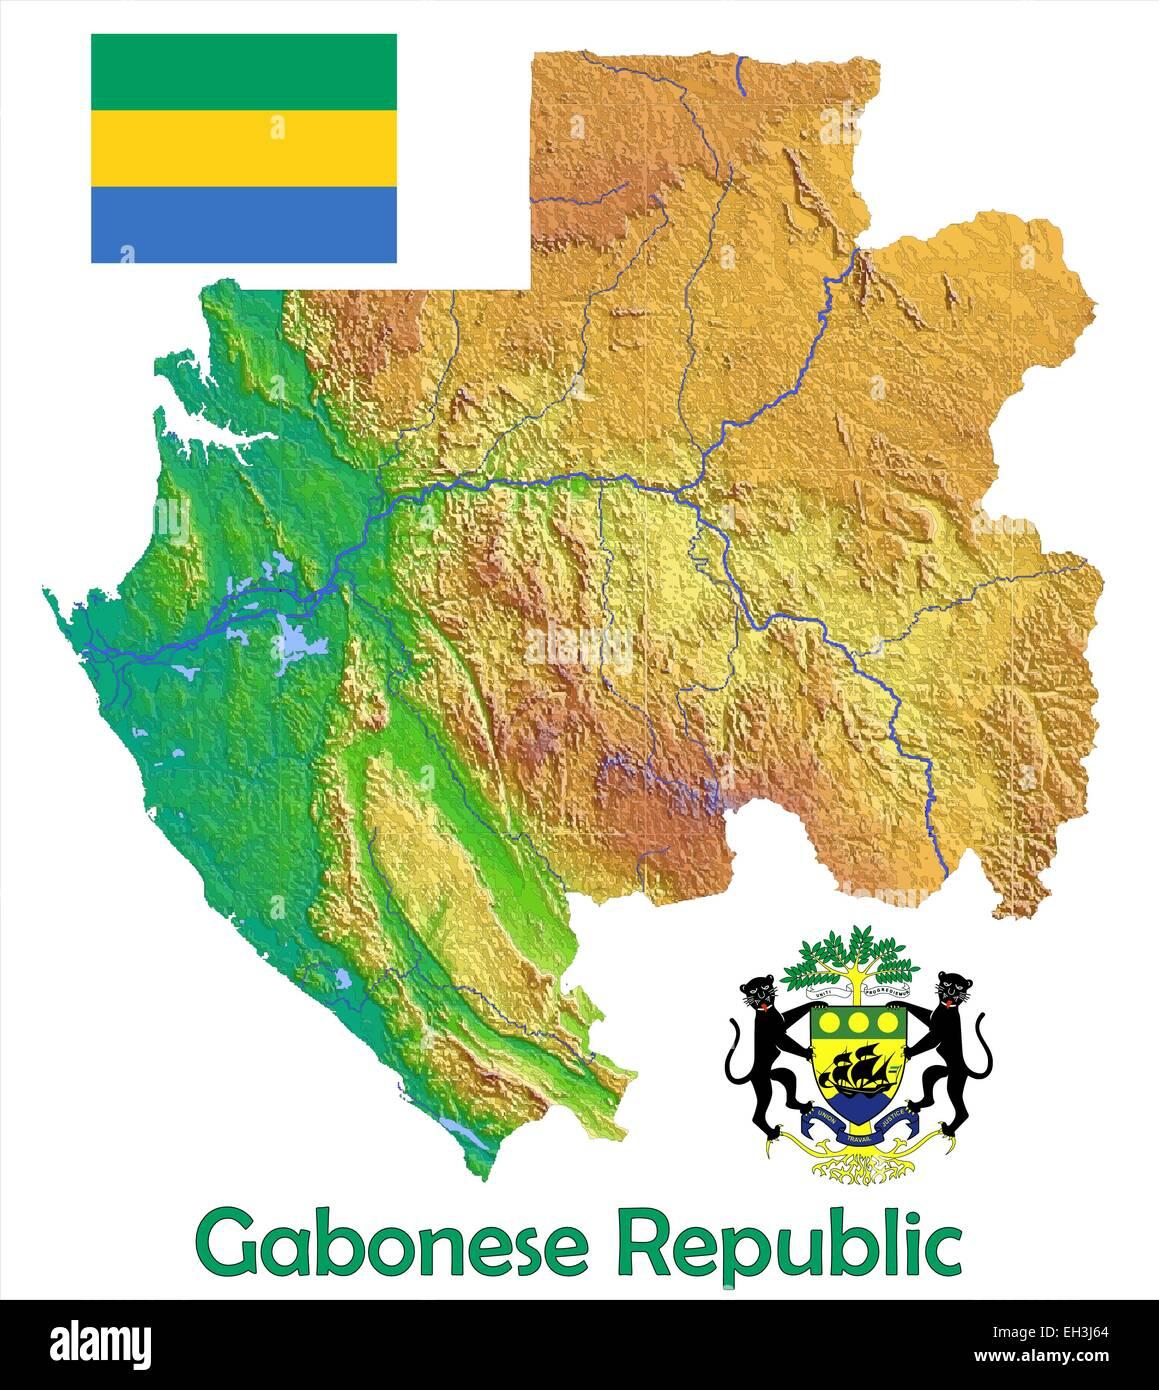 Gabon Africa Map Flag Coat Stock Vector Art Illustration Vector